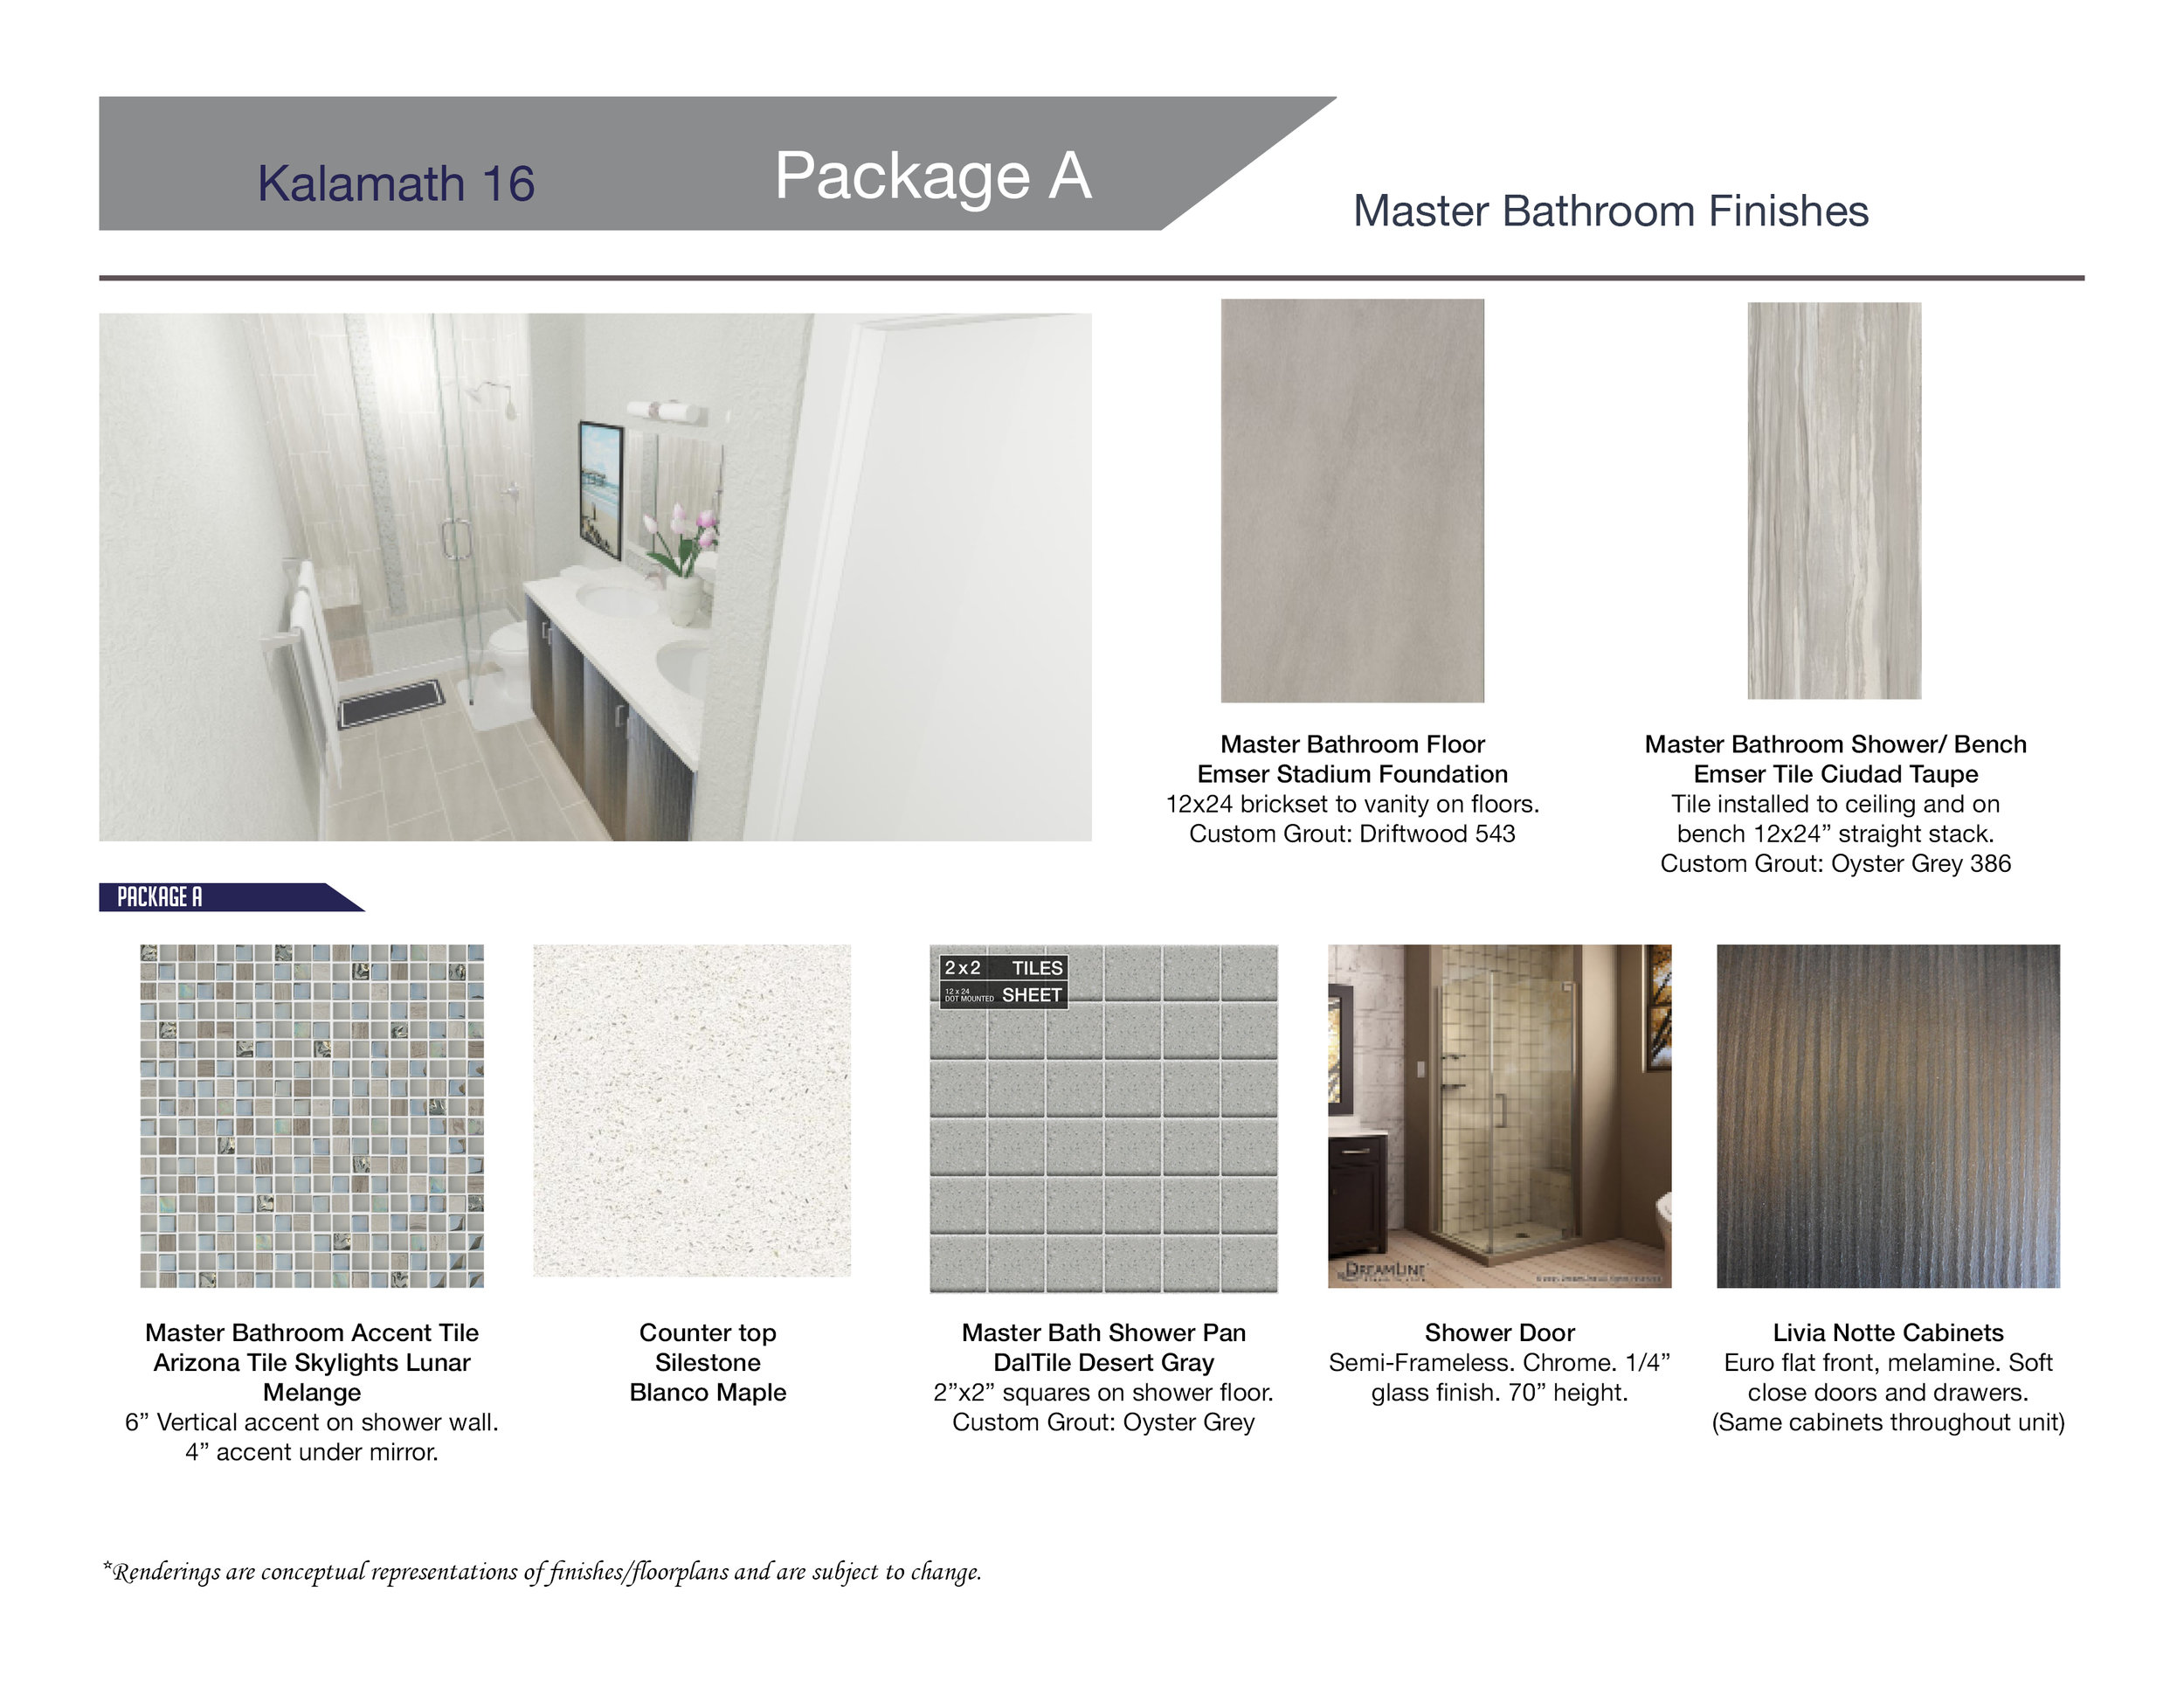 Kalamath Package A new6.jpg